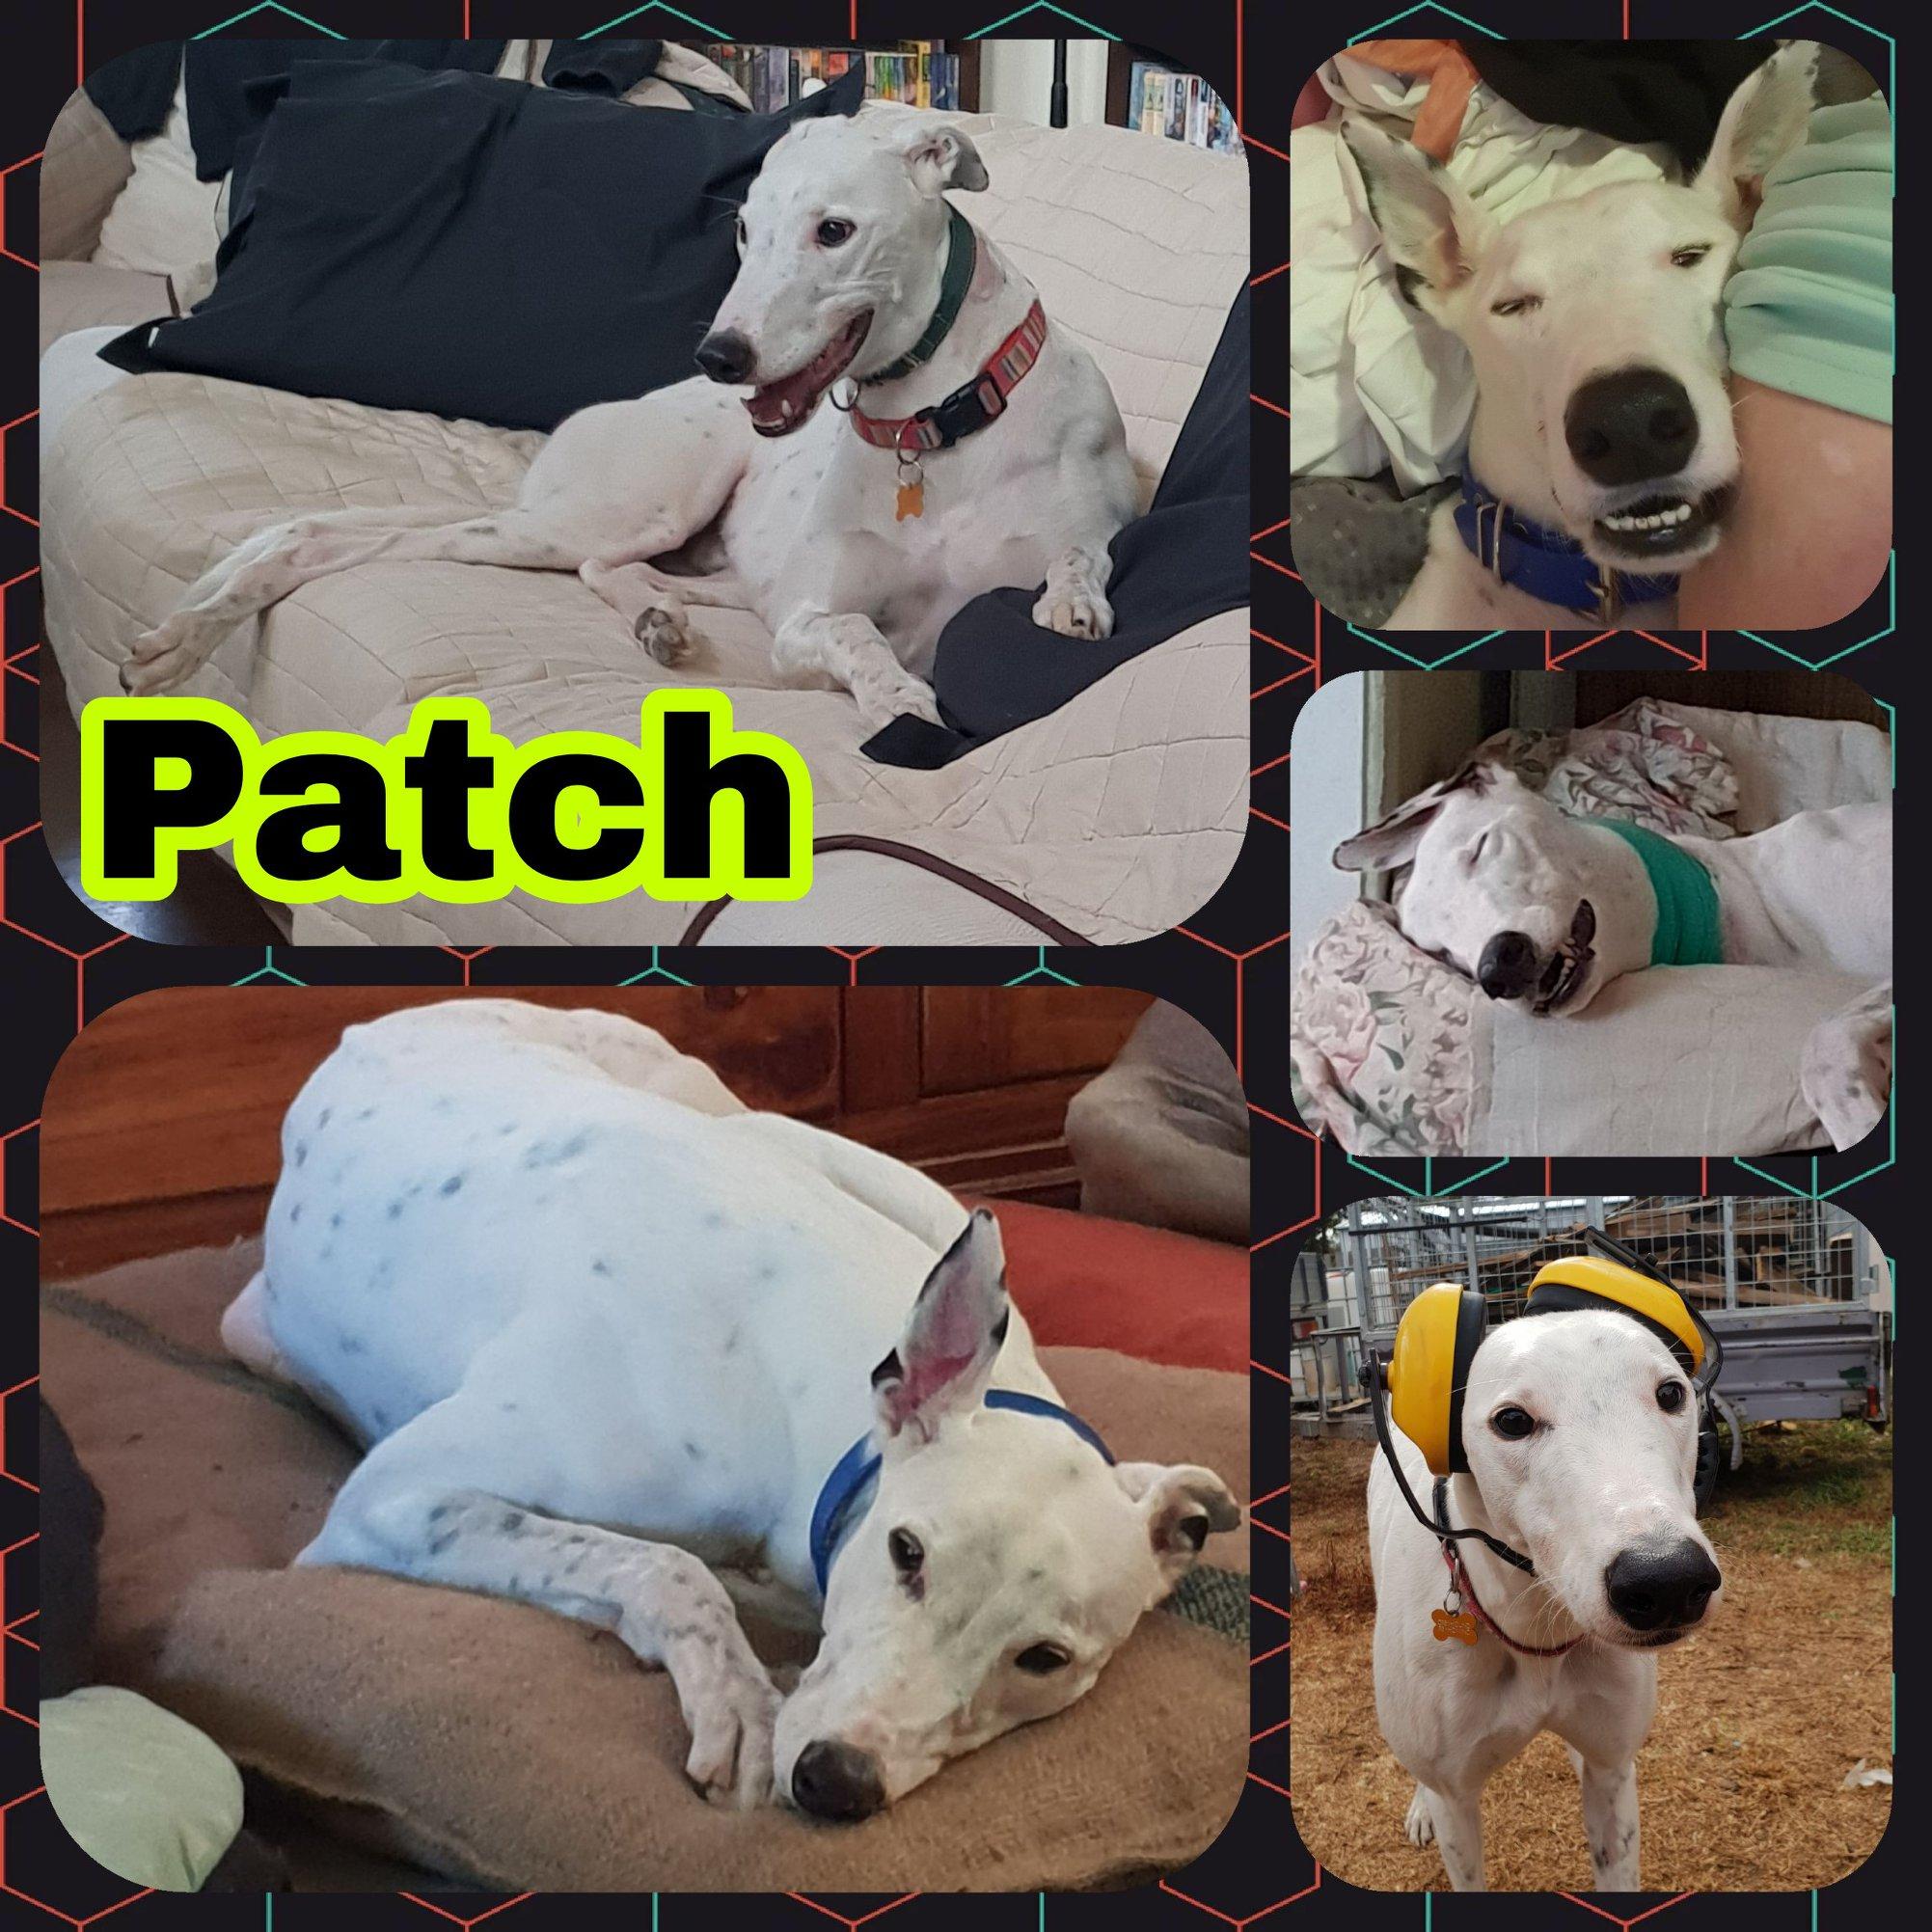 Patch (Patch His Zipper)